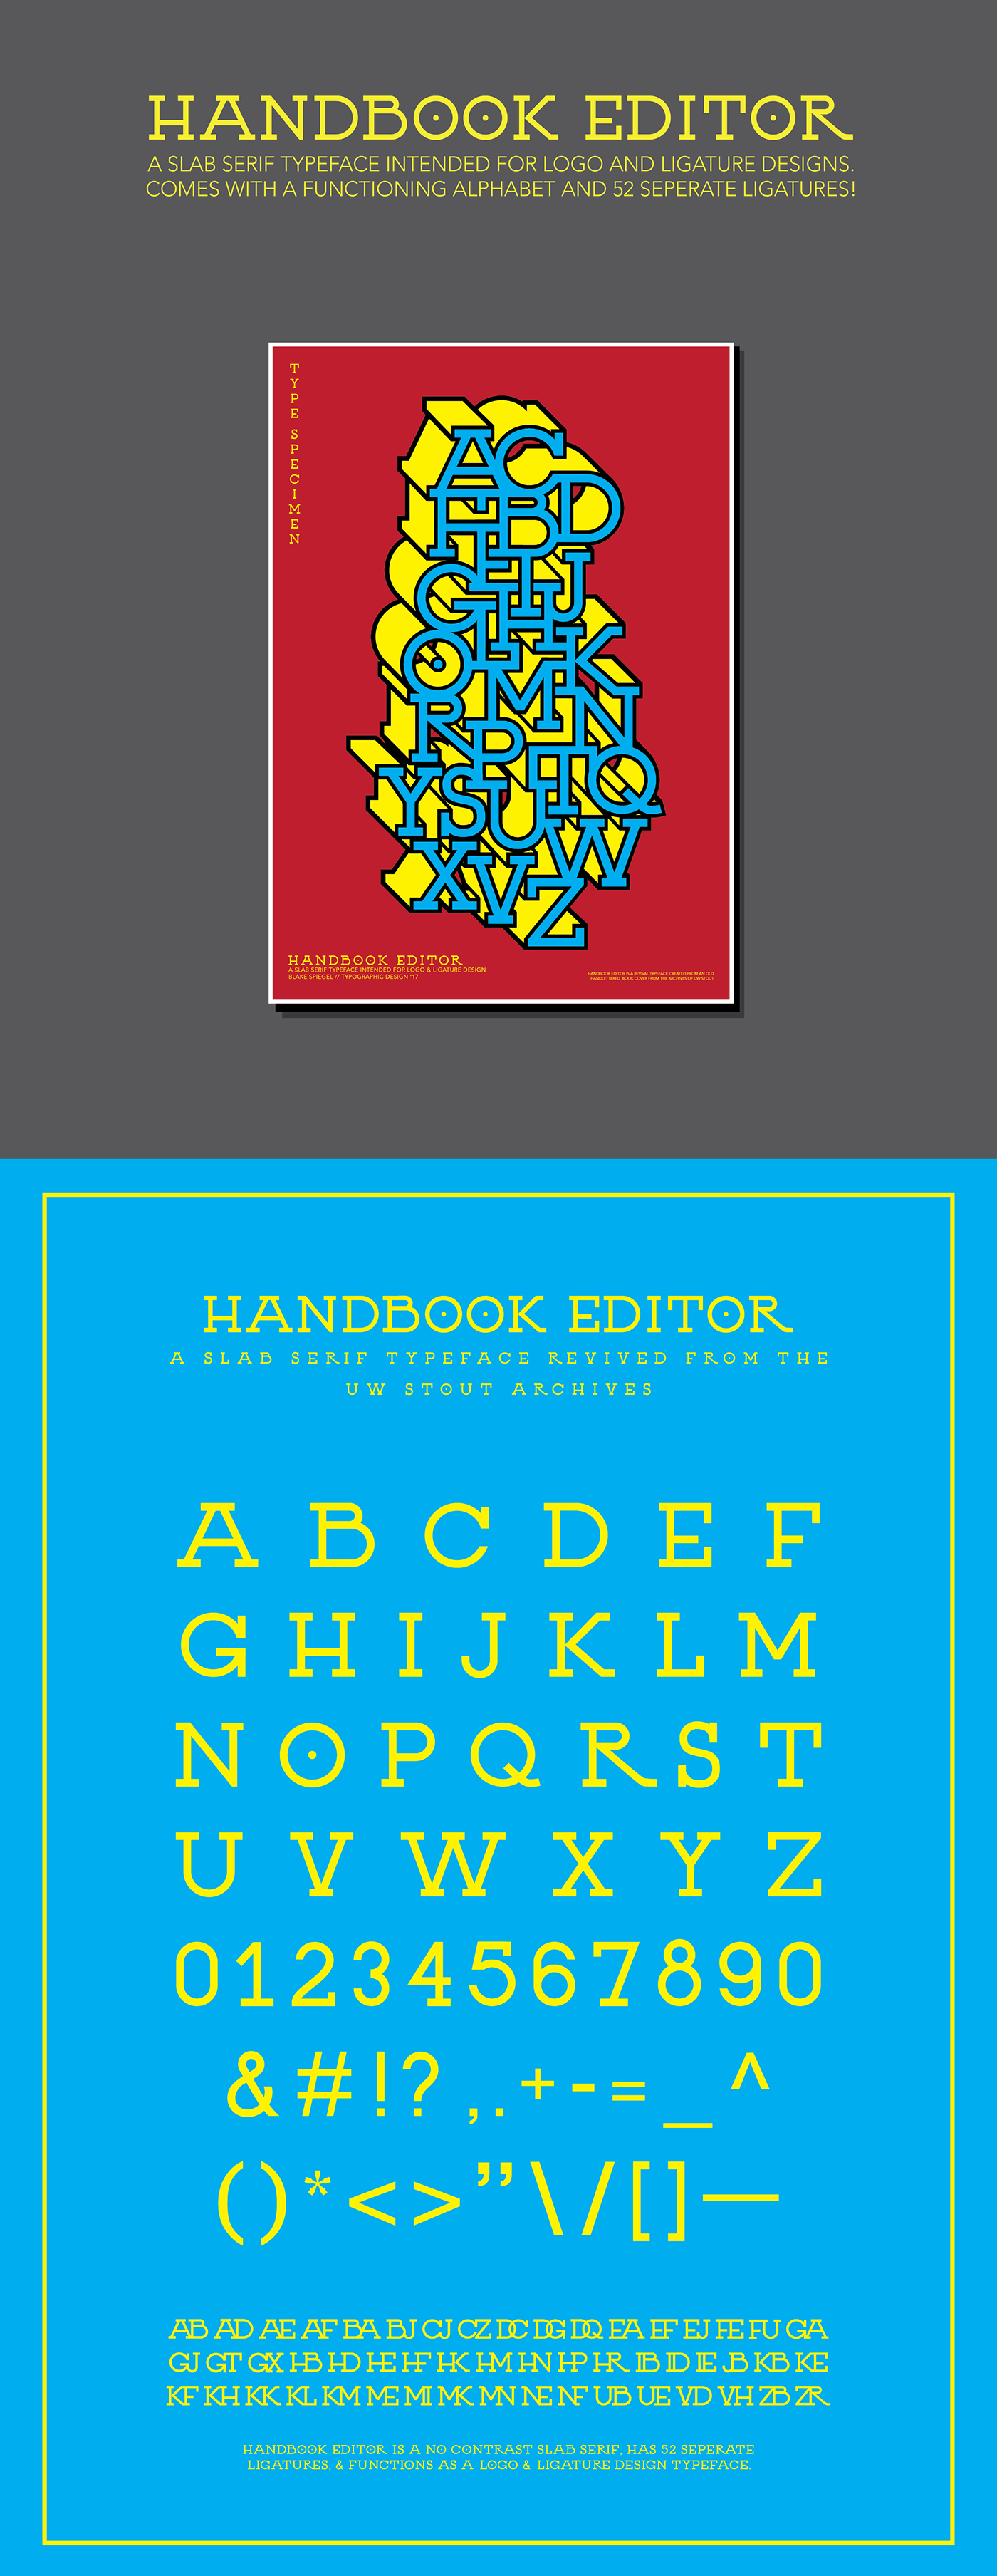 Handbook Editor Typeface